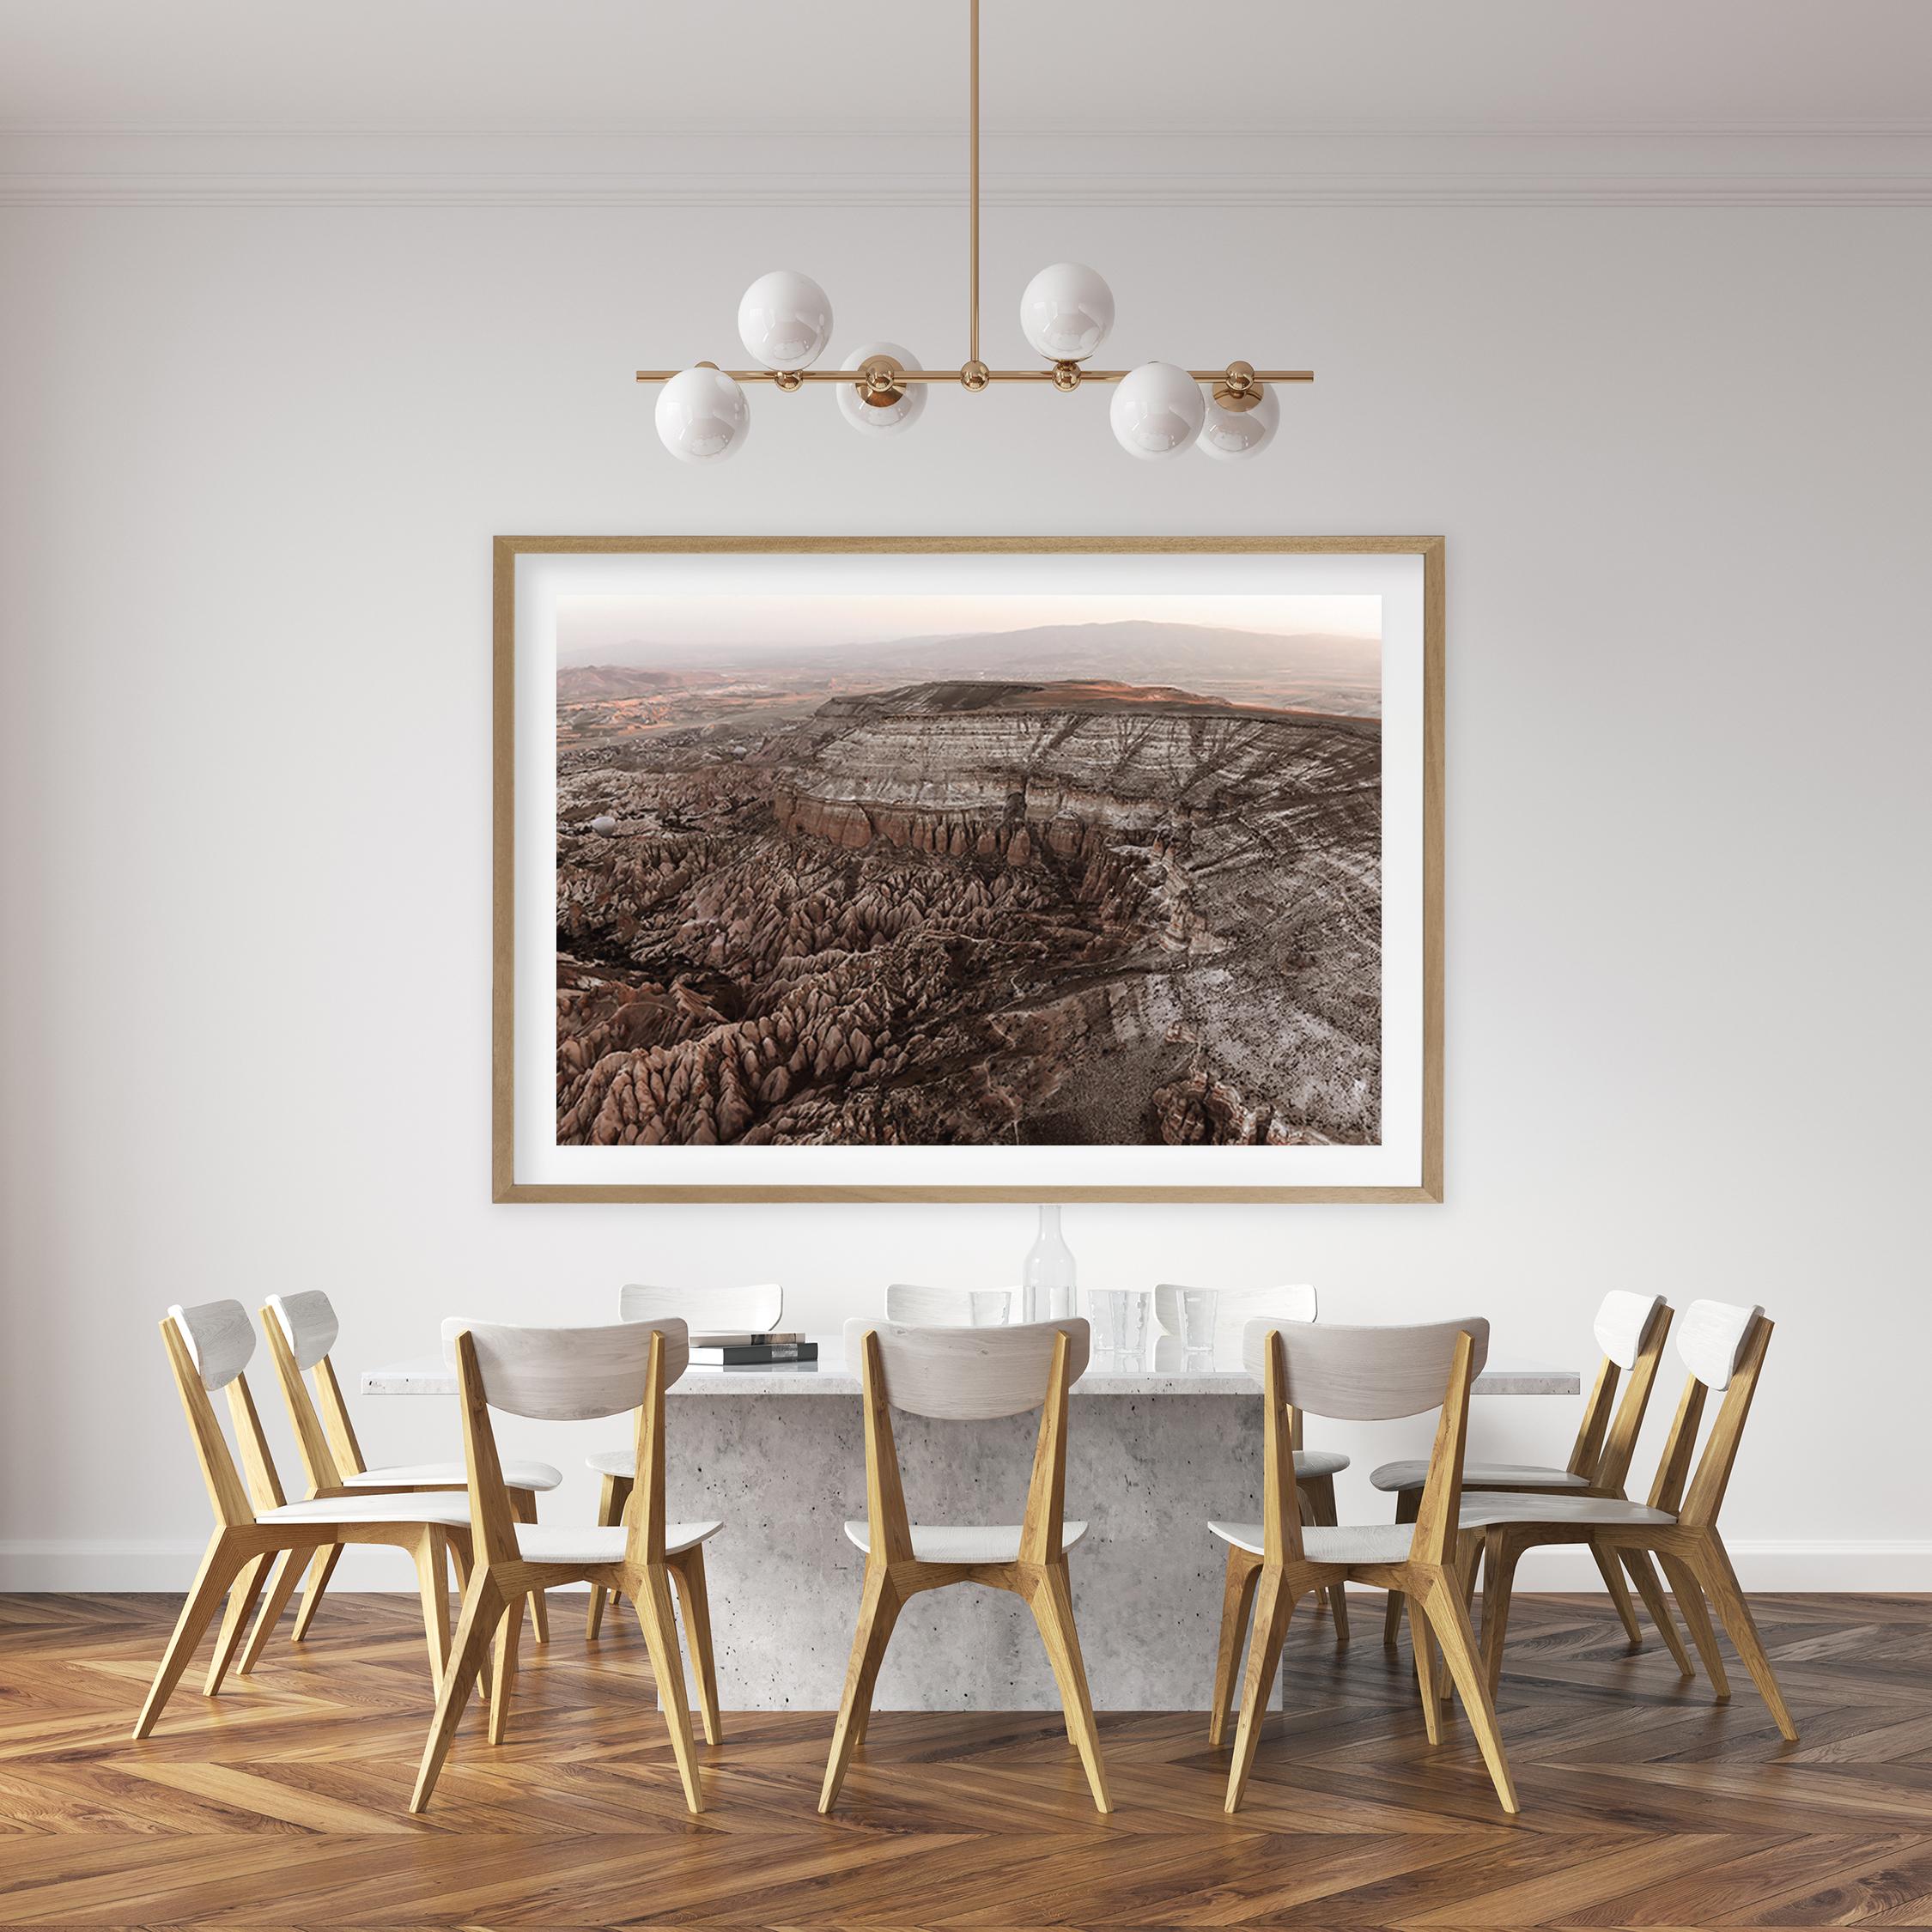 scandinavian-style-interior-wall-art-print-photography-stephanie-janett.jpg